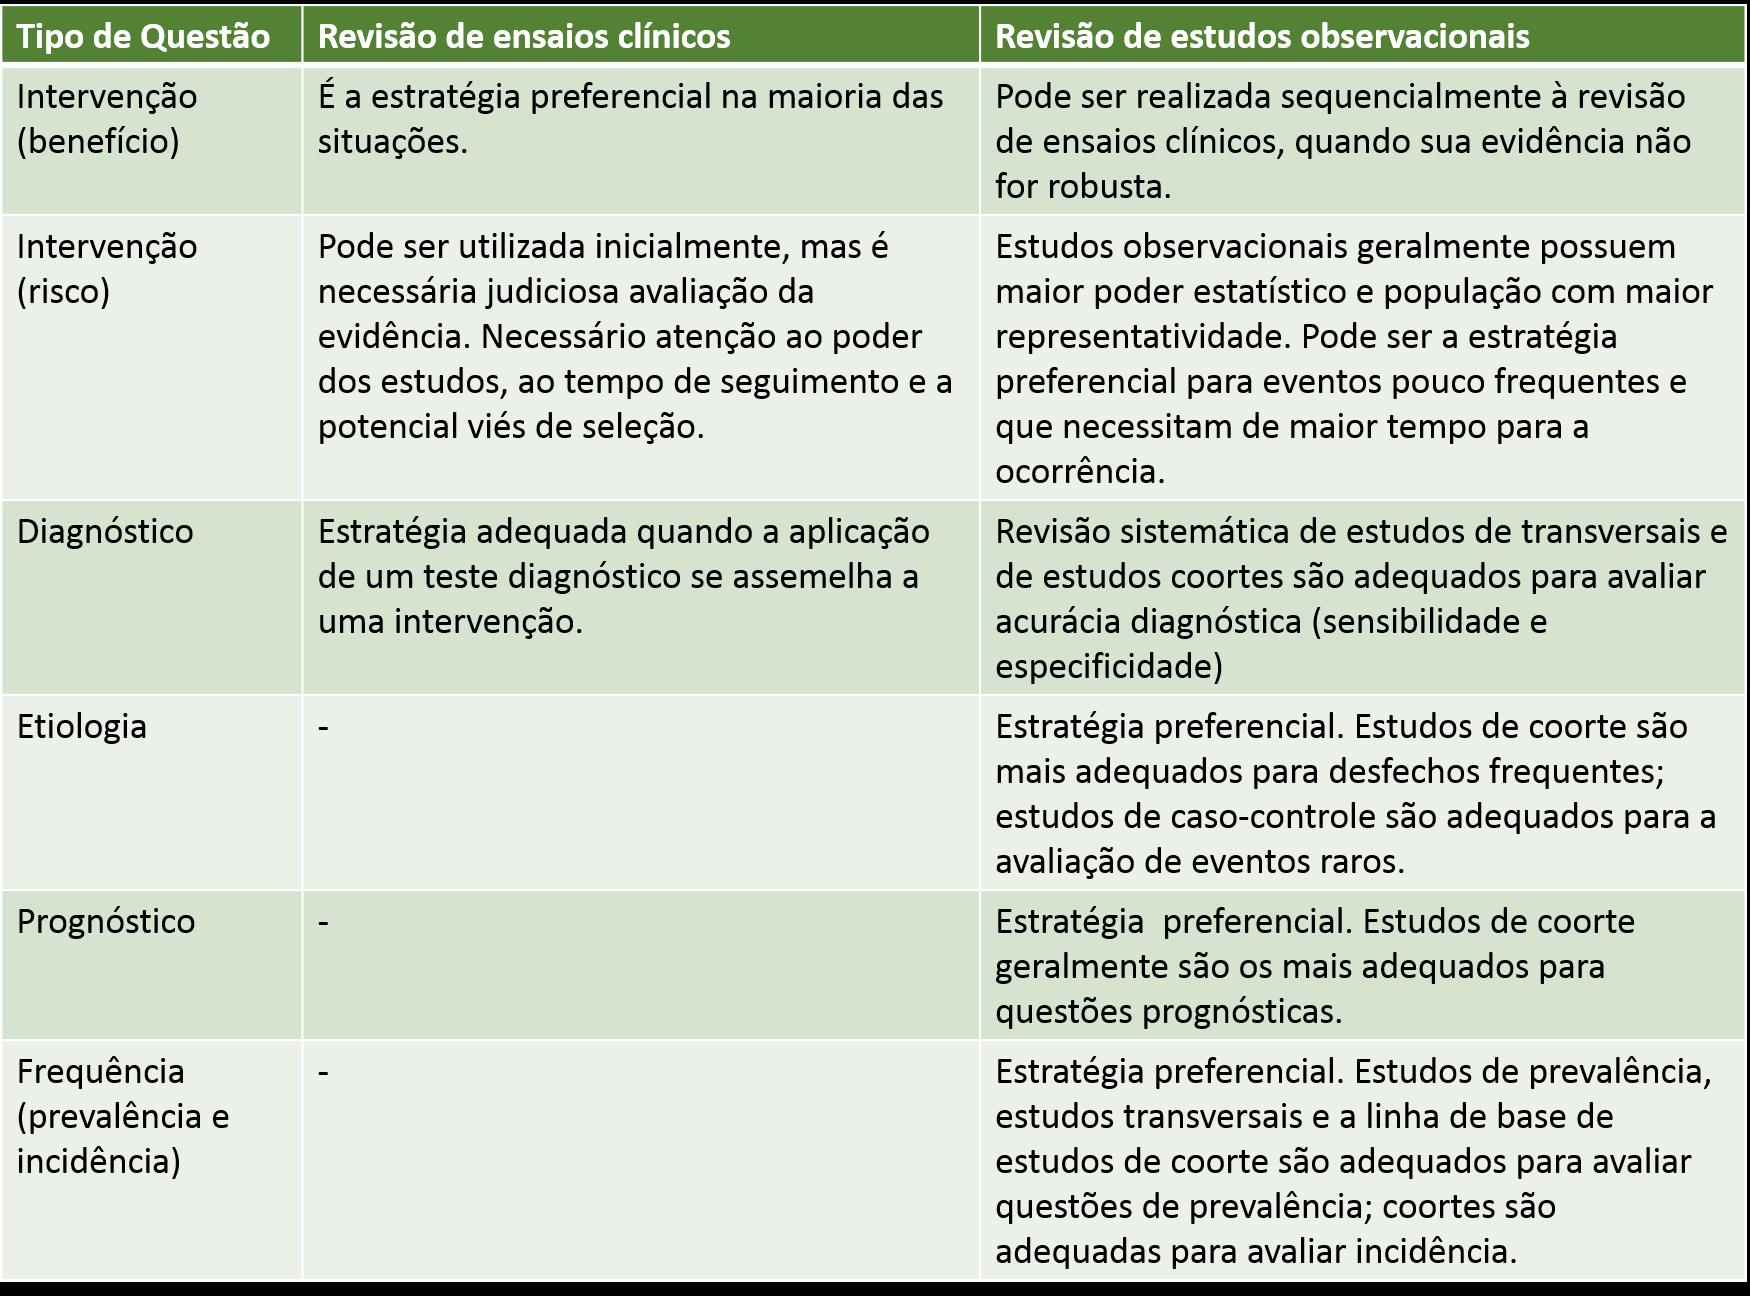 tabela observacional ecr